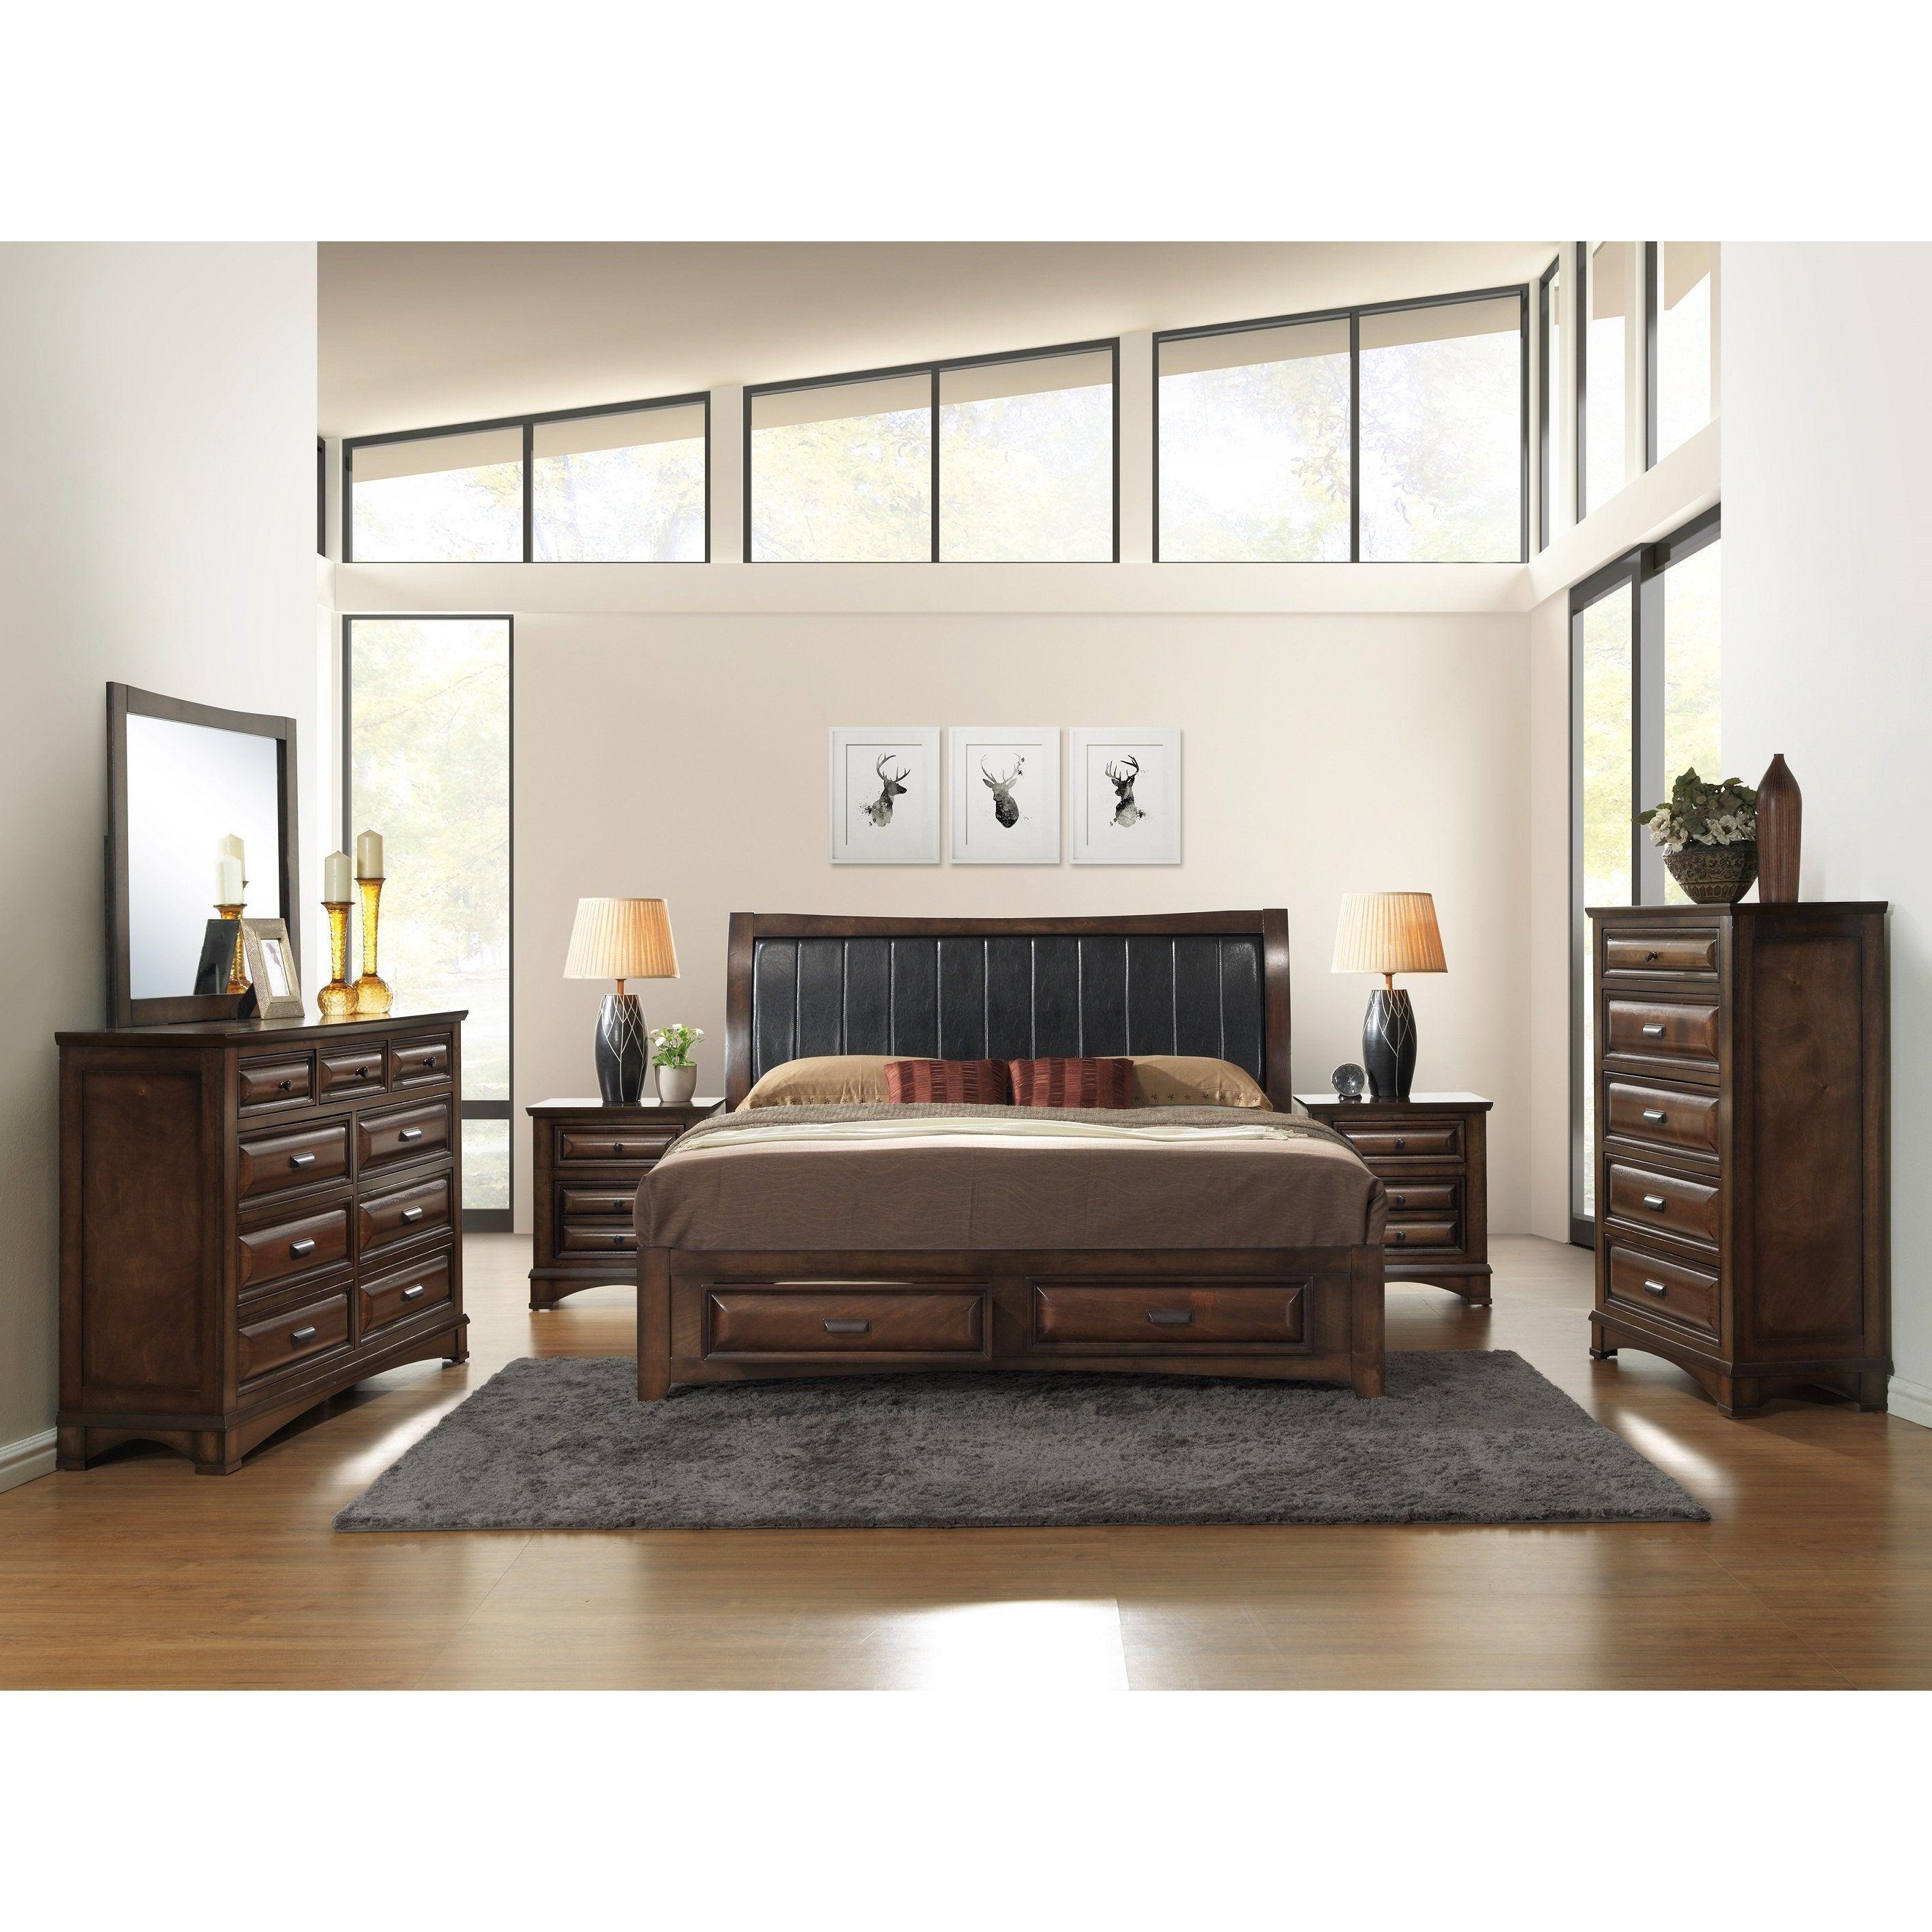 Broval 179 6Piece Light Espresso Finish Wood Queensize Bedroom New Queen Size Bedroom Sets Design Inspiration